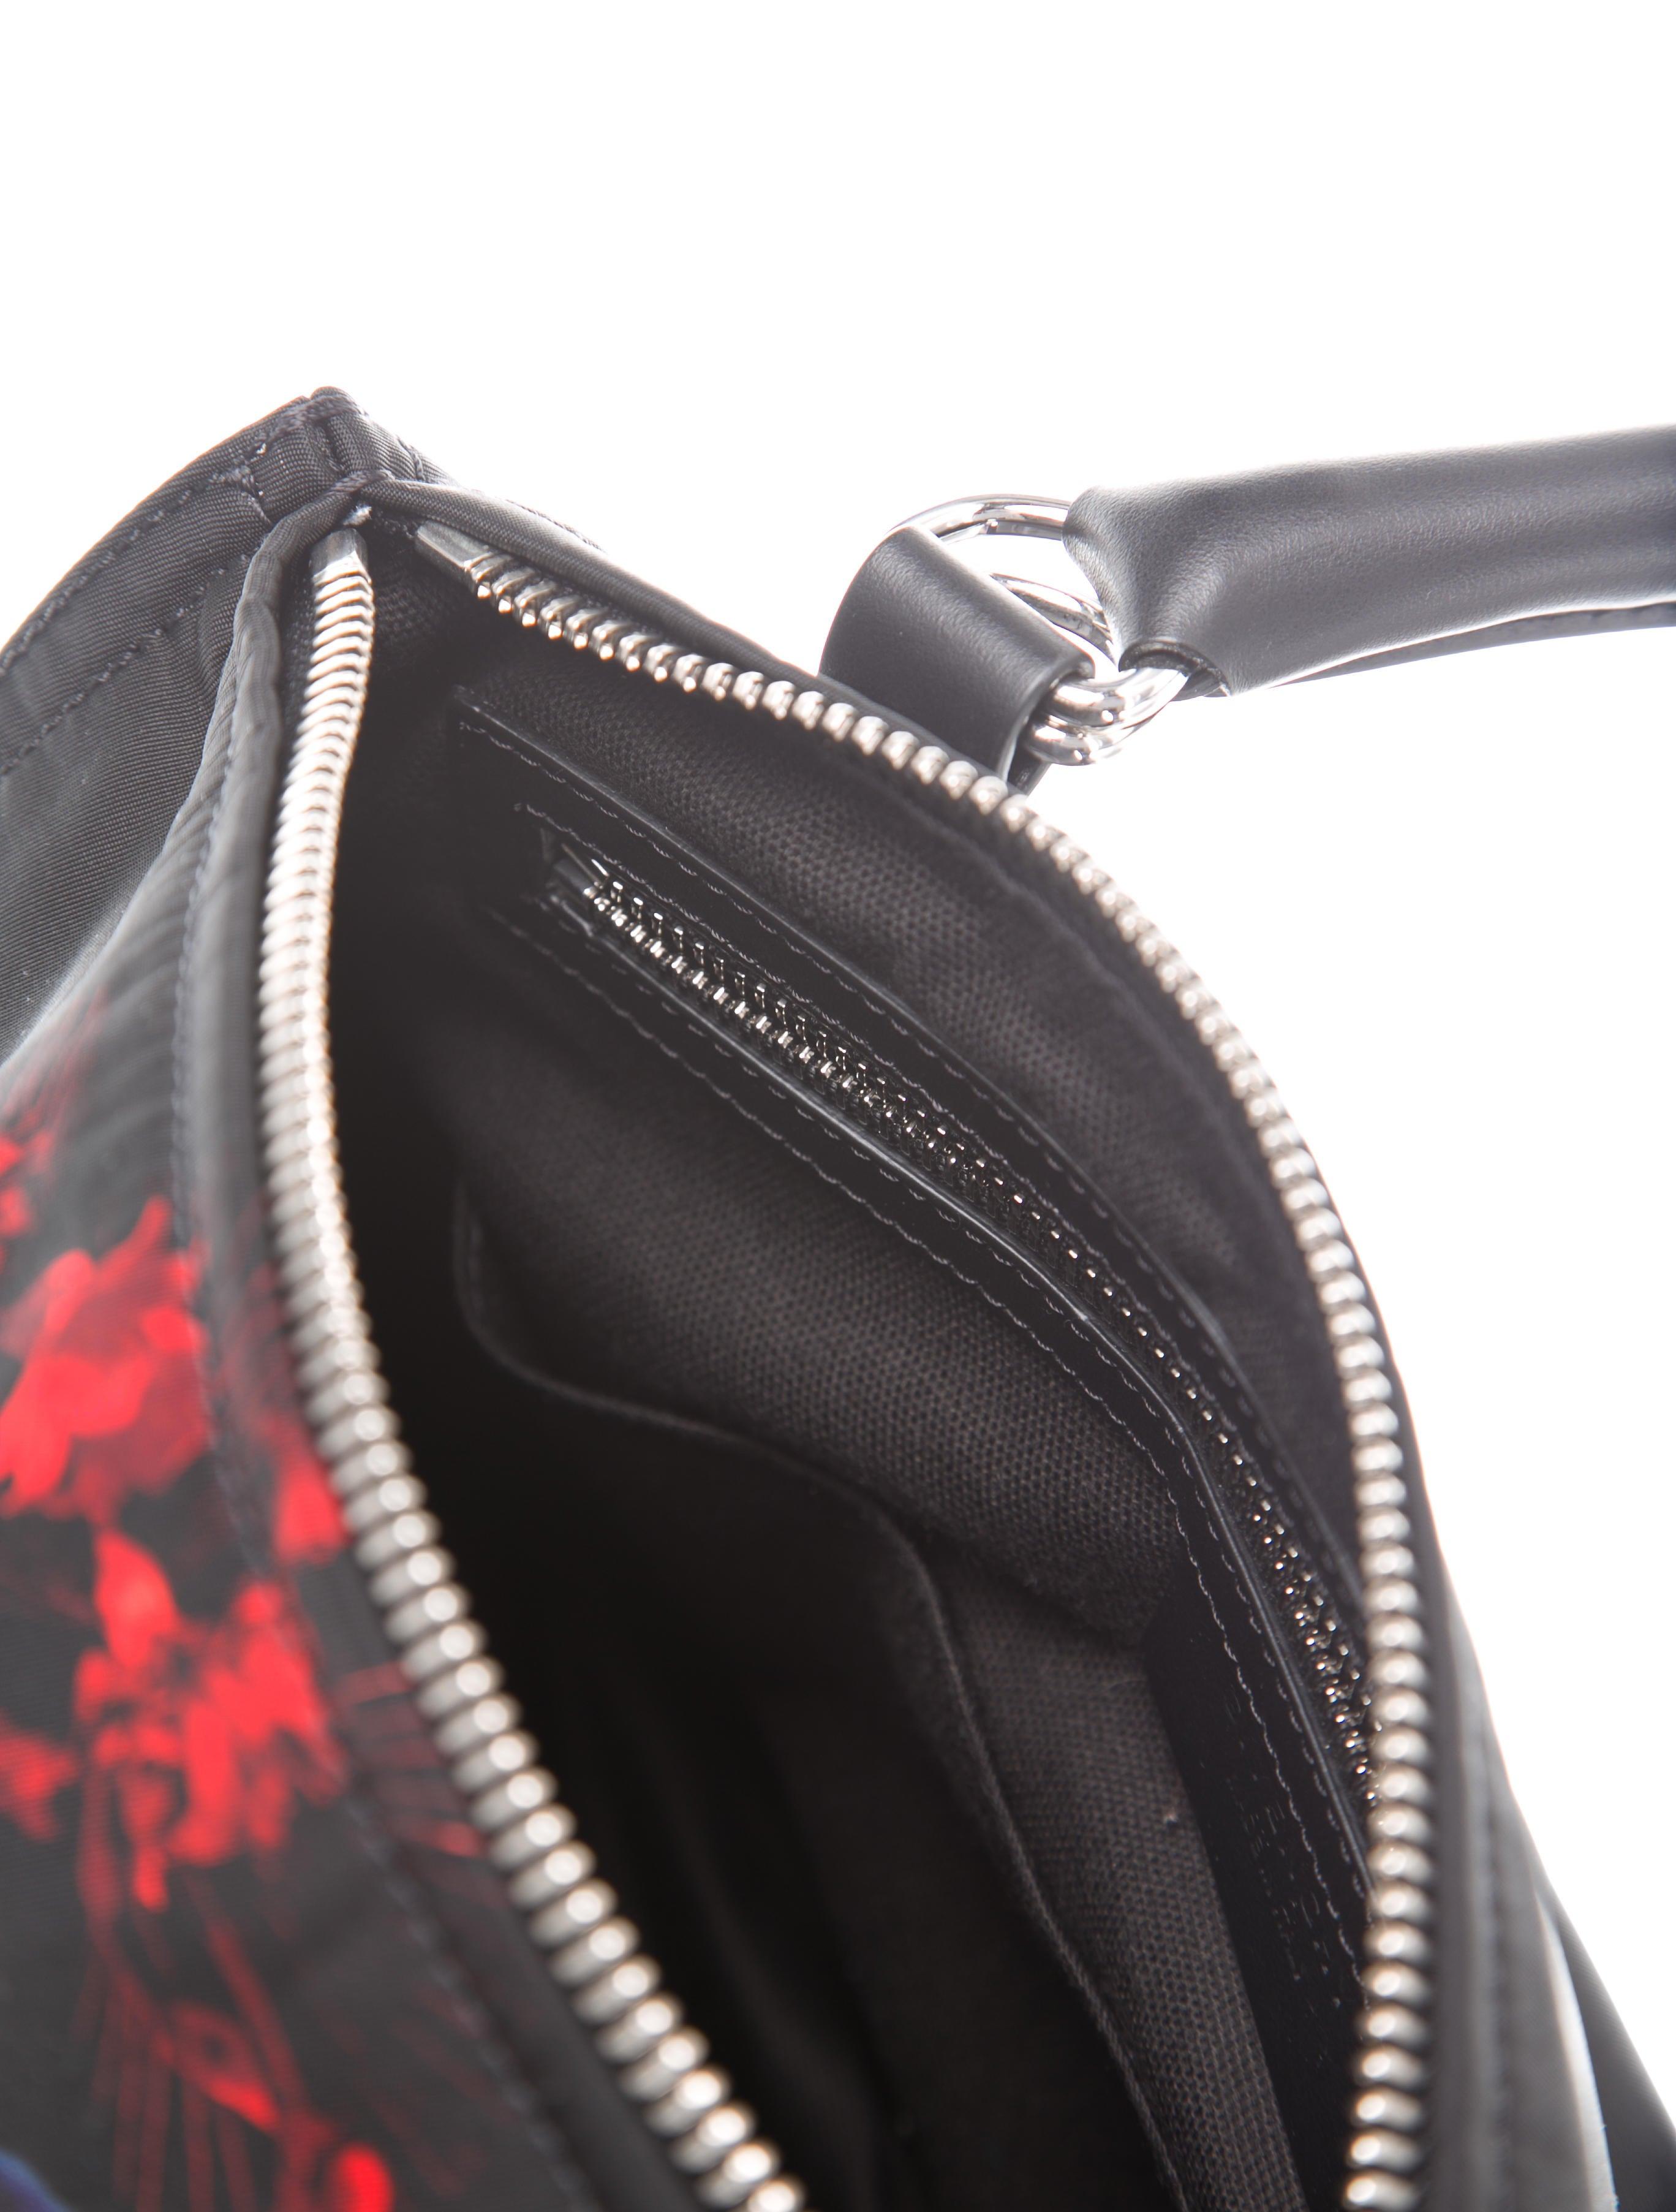 bag women jaguar in pin crossbody shoulder handbags white s leather chain head bags valentino